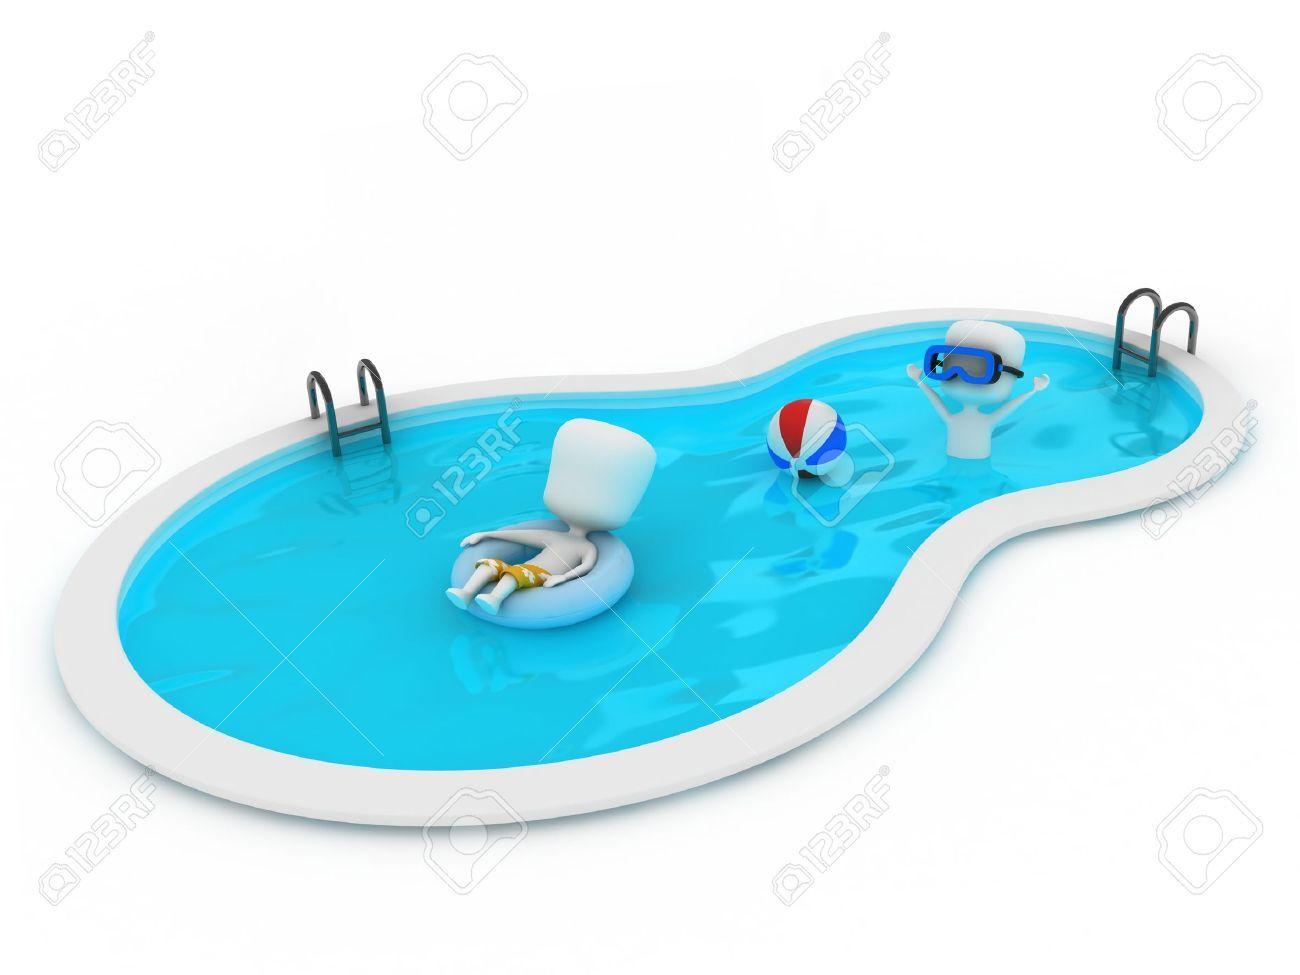 drawn xxx comic swimming pool. Black Bedroom Furniture Sets. Home Design Ideas